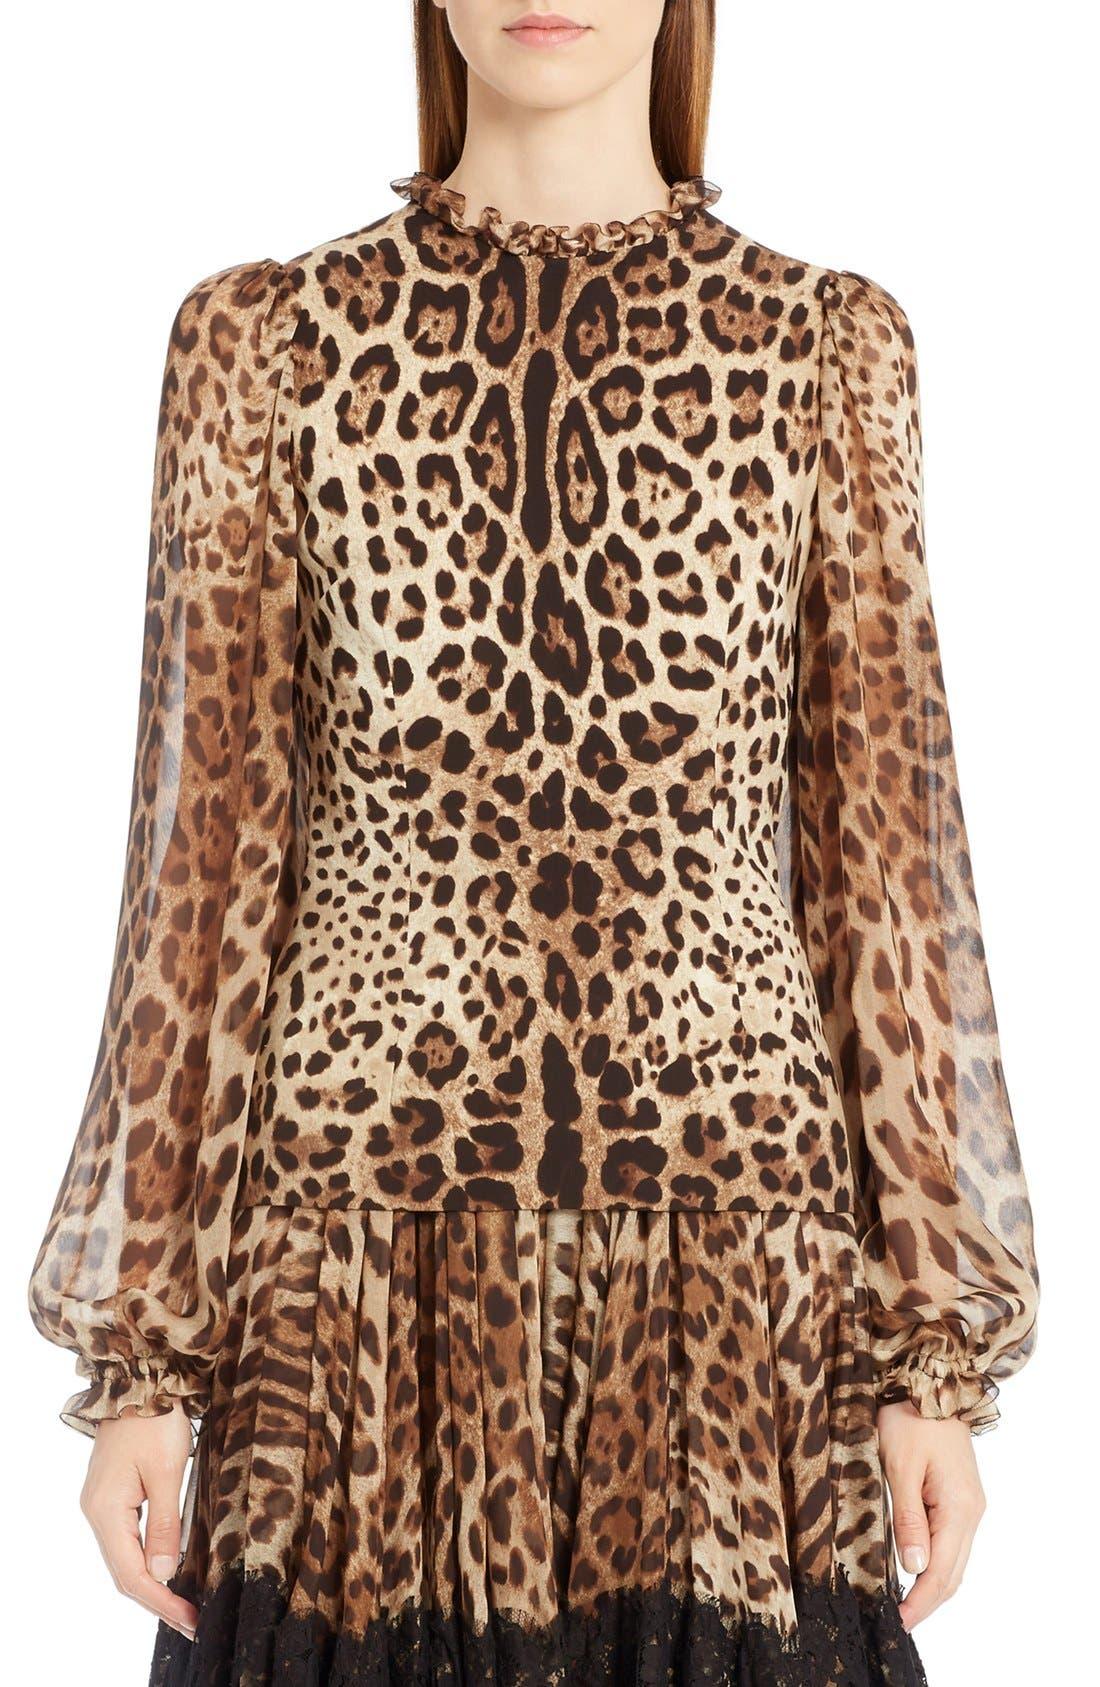 Dolce&Gabbana Leopard Print Stretch Cady Blouse